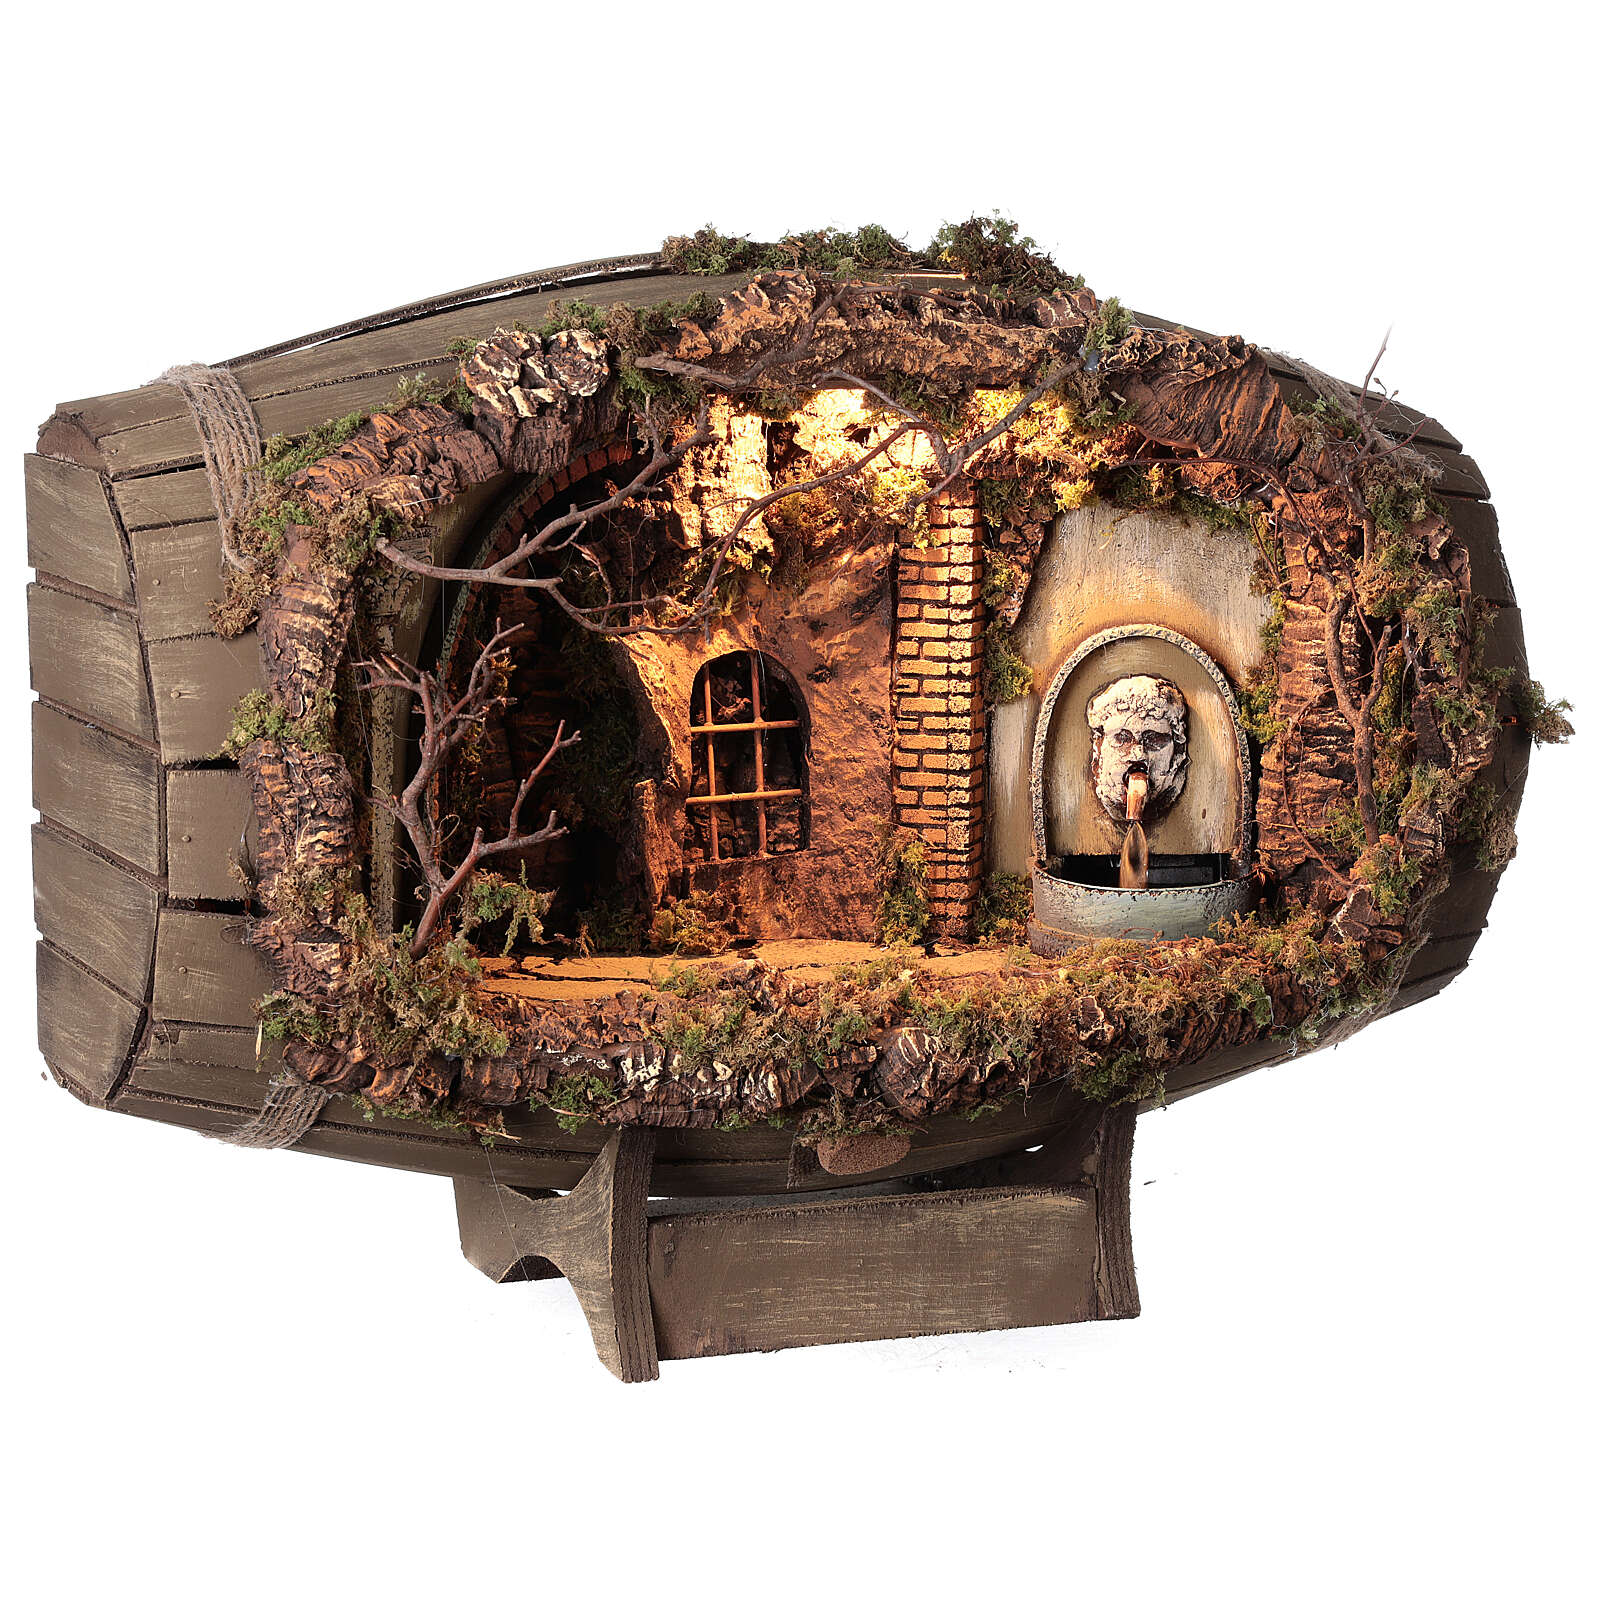 Horizontal barrel for Neapolitan Nativity Scene with 12-15 cm figurines 4